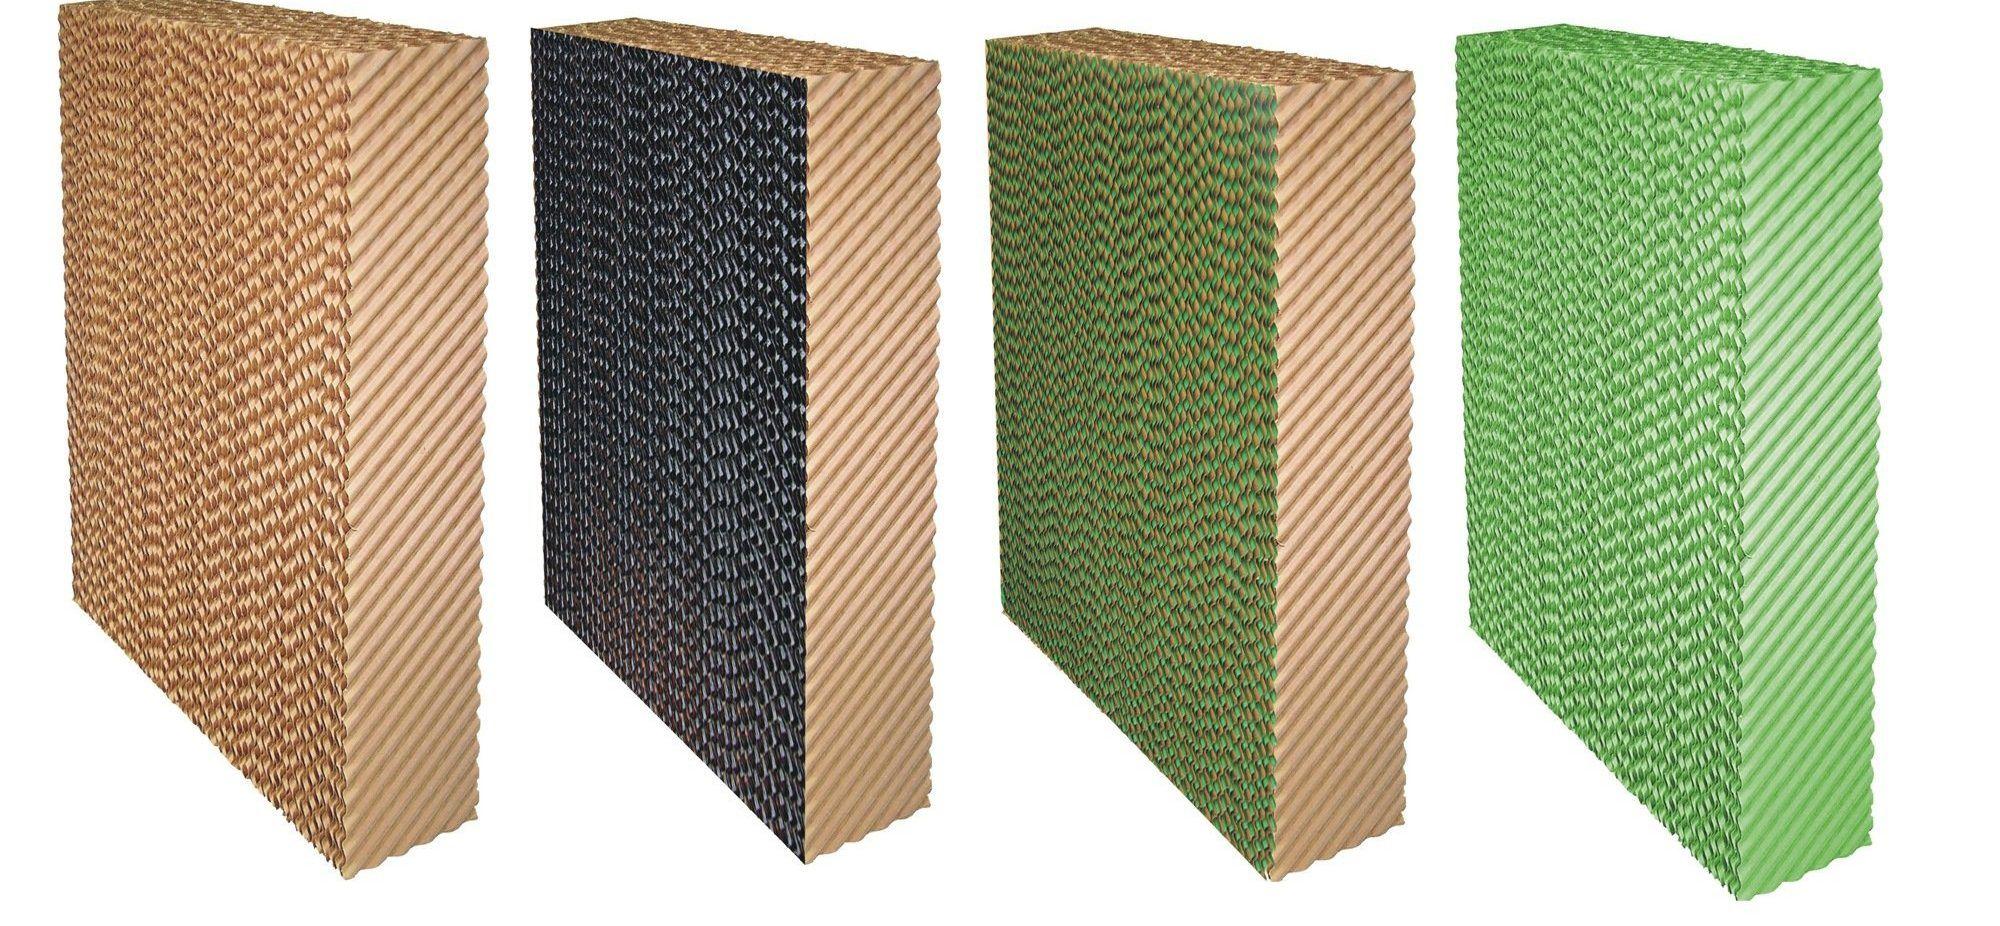 انواع مختلف پد سلولزی شرکت هوا سلولز